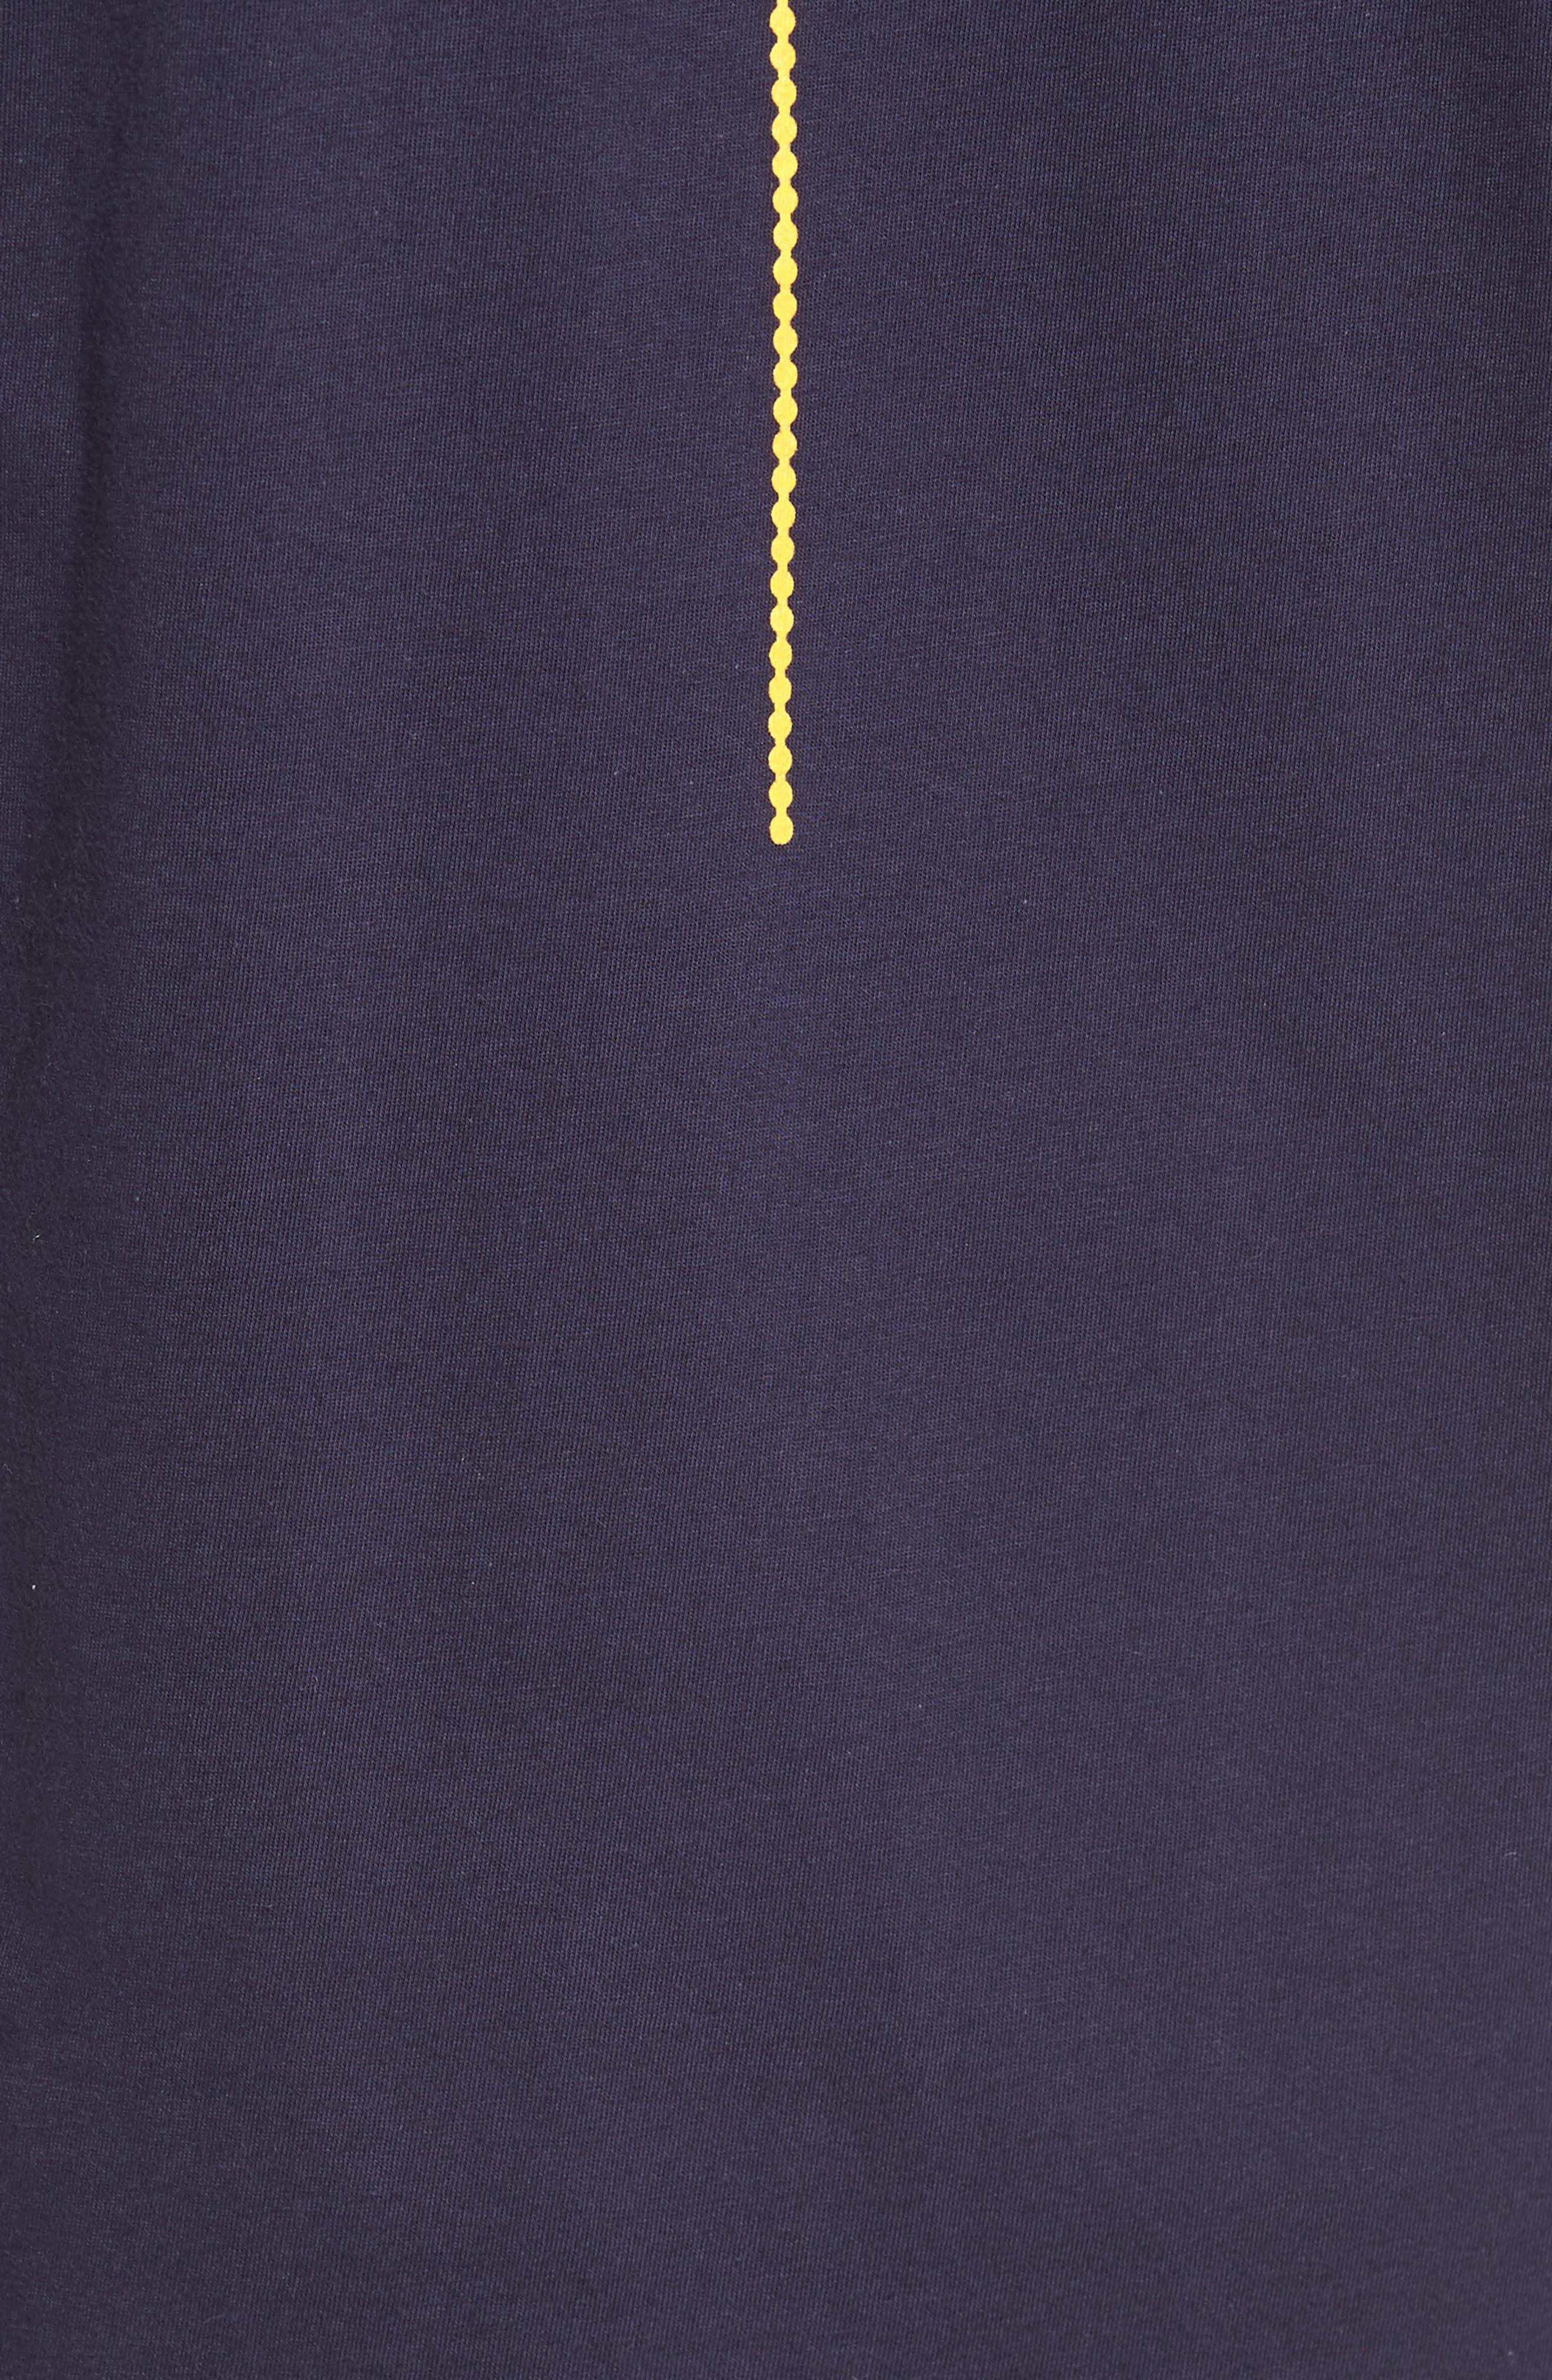 Keeping Seatown Lit T-Shirt,                             Alternate thumbnail 5, color,                             400